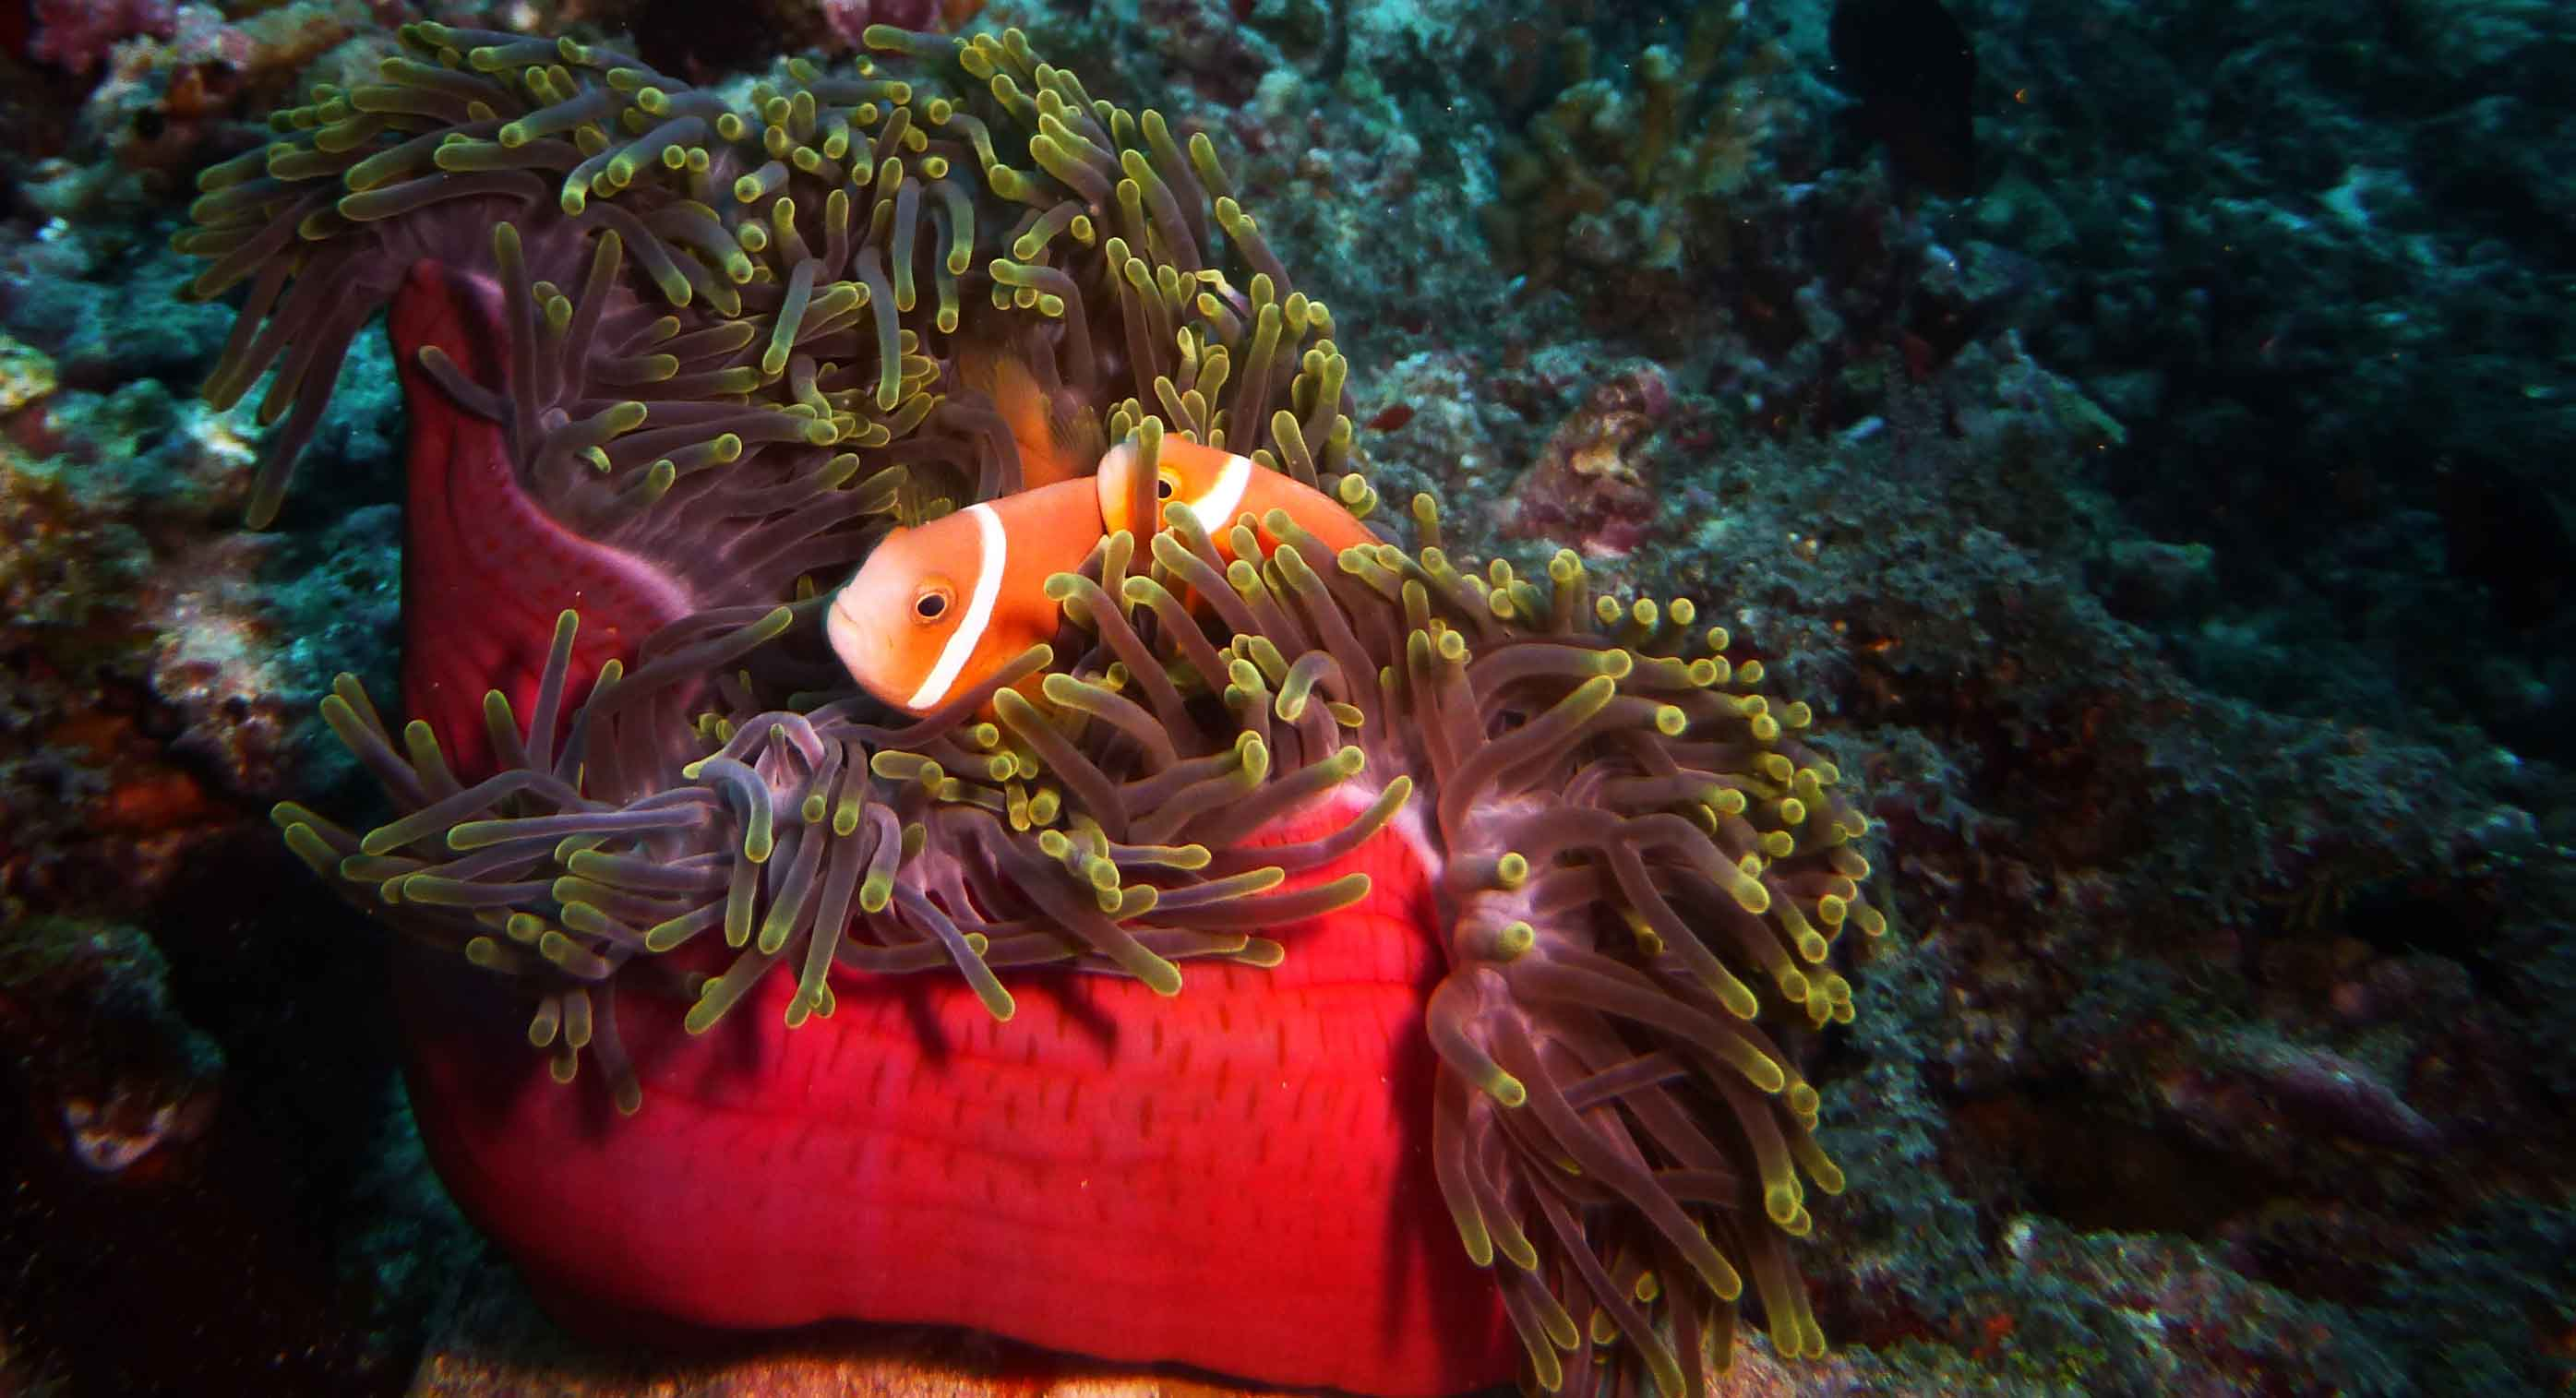 Malediven tauchen: Clownfish in Anemone